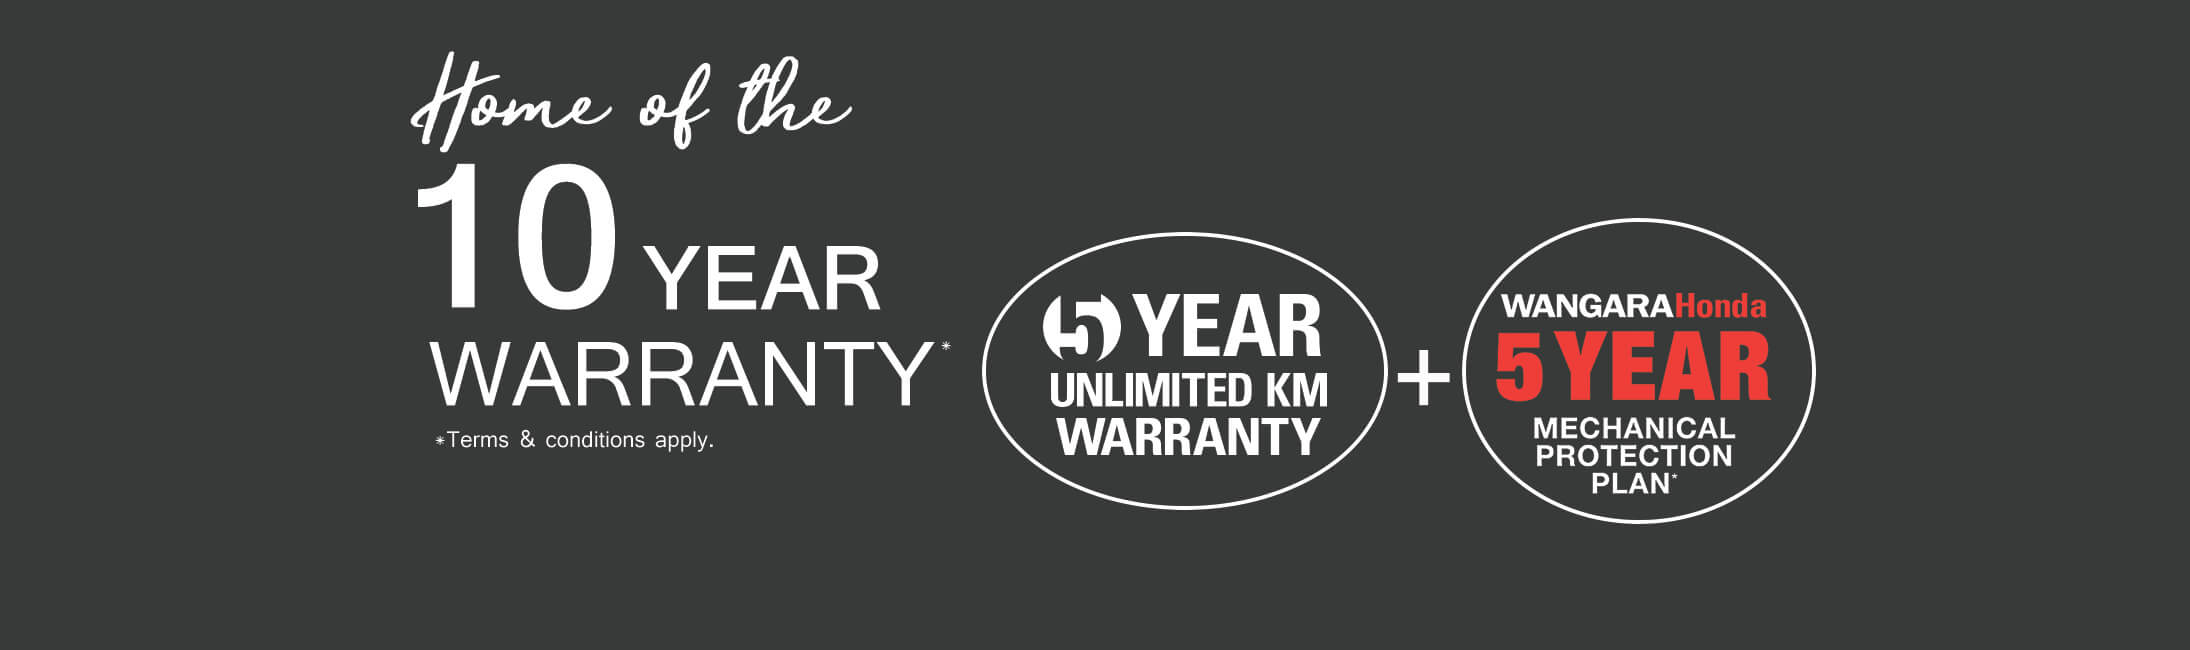 Wangara Honda - 10 Year Warranty